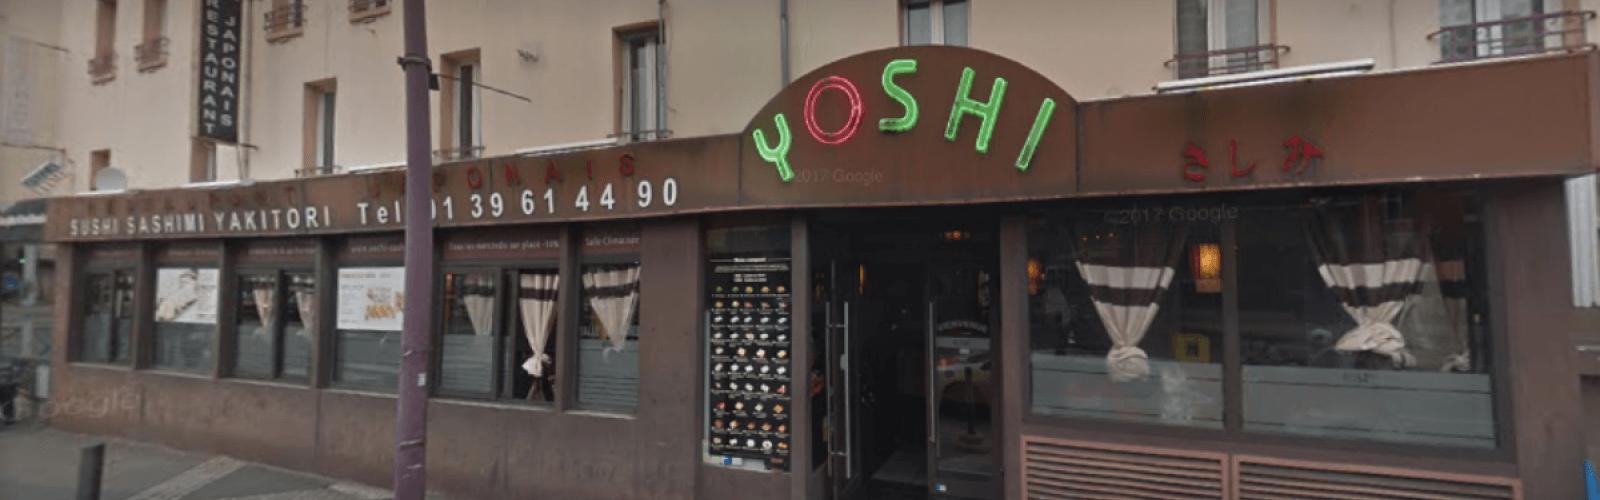 Yoshi Sushi Bezons